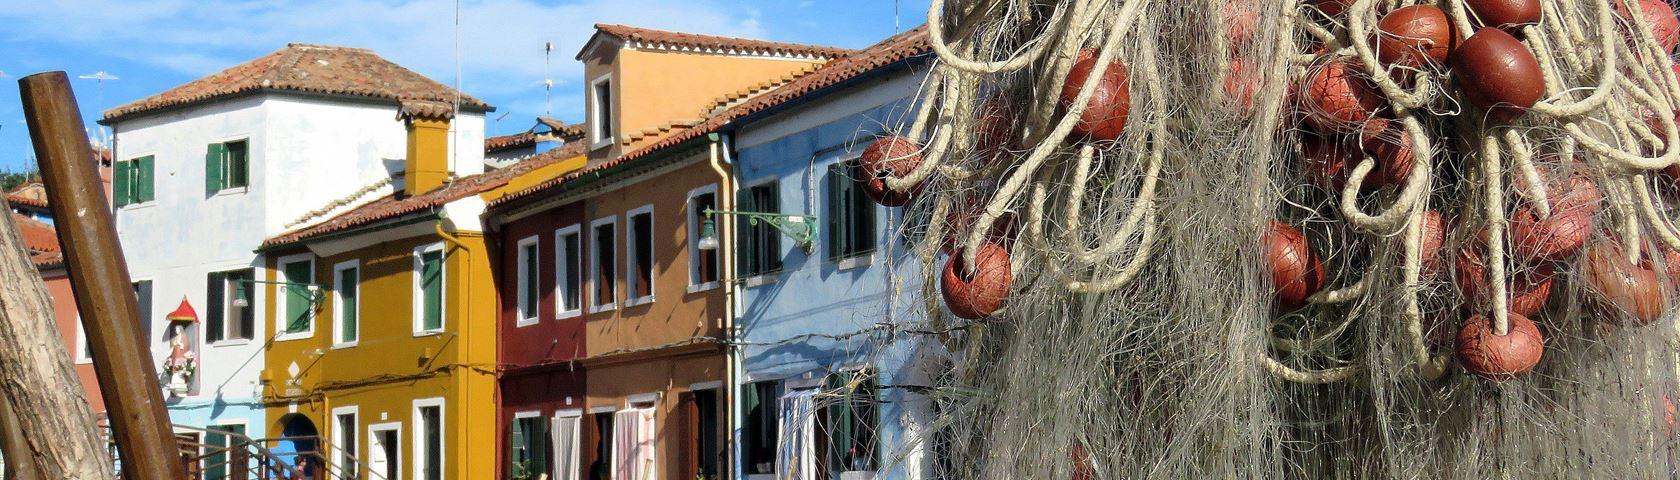 Inside Bureno Town